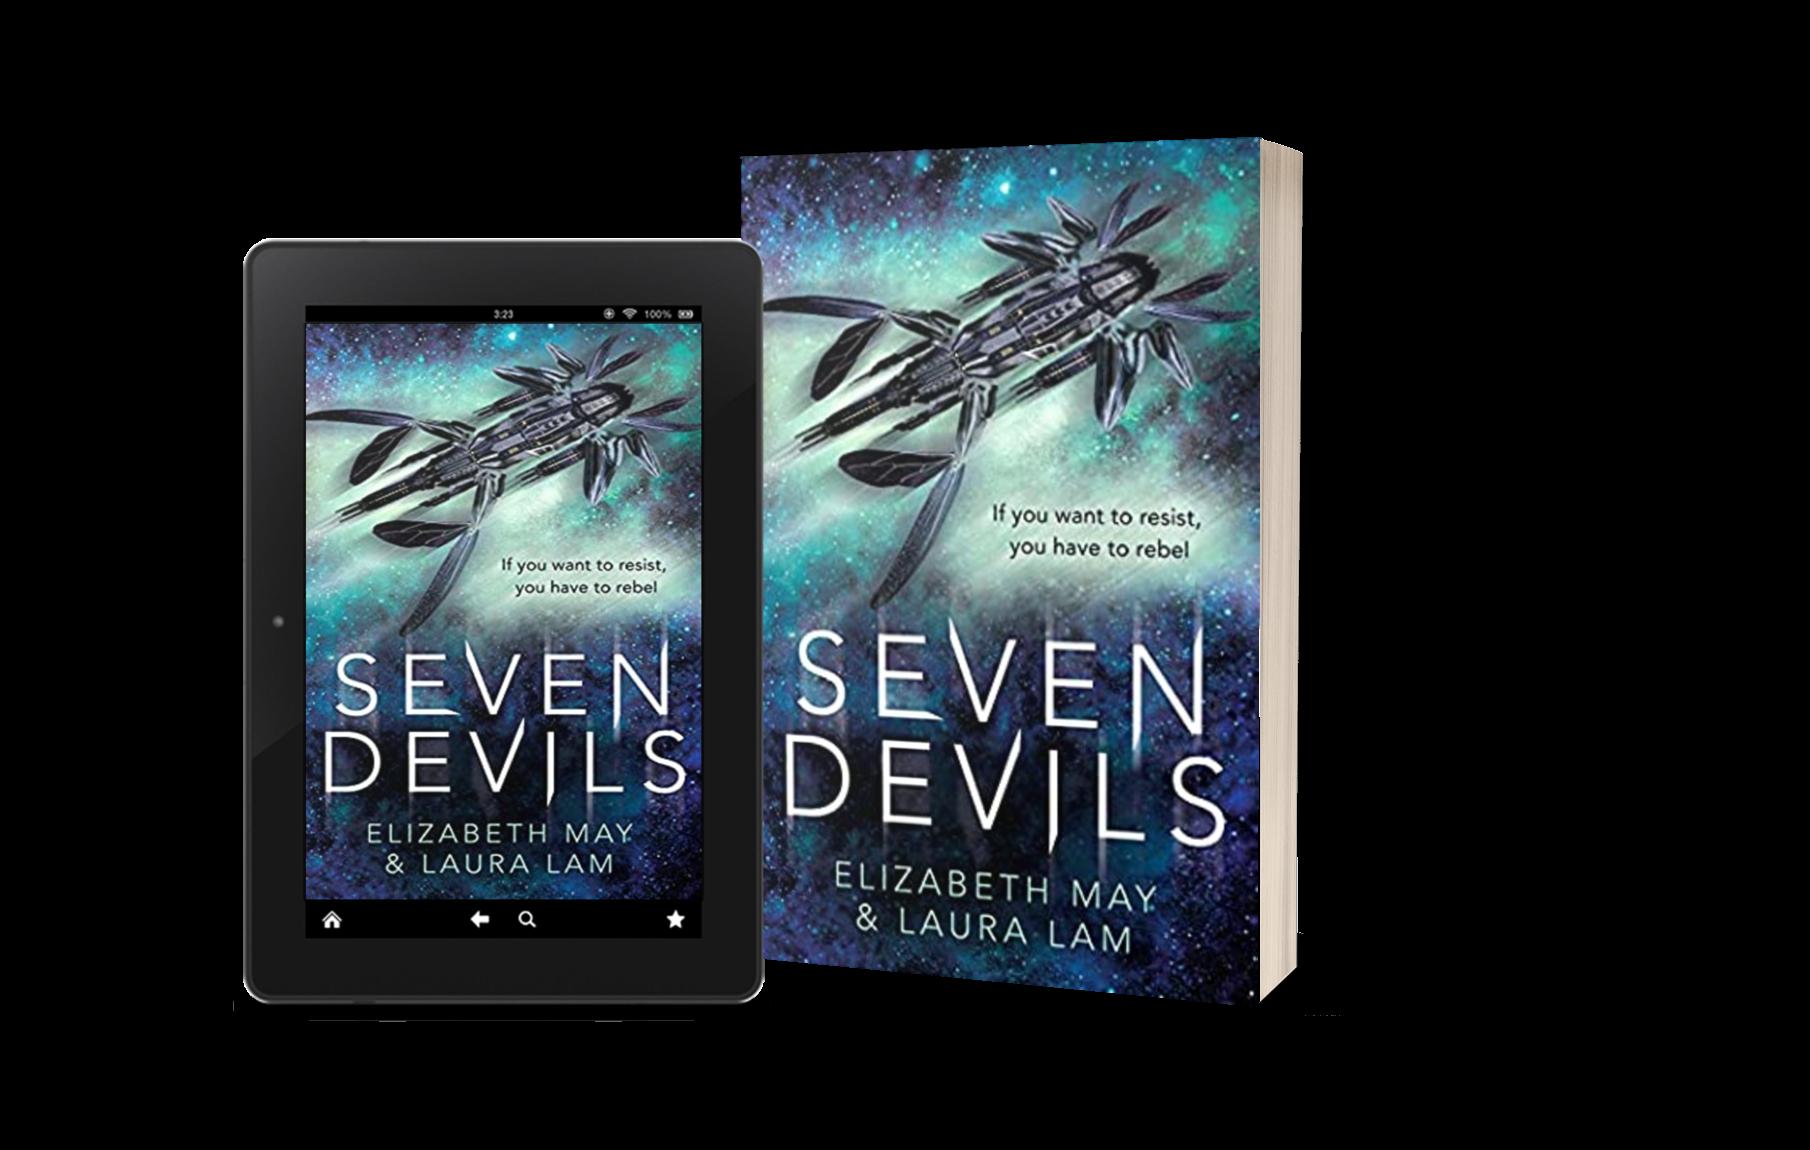 Seven Devils cover